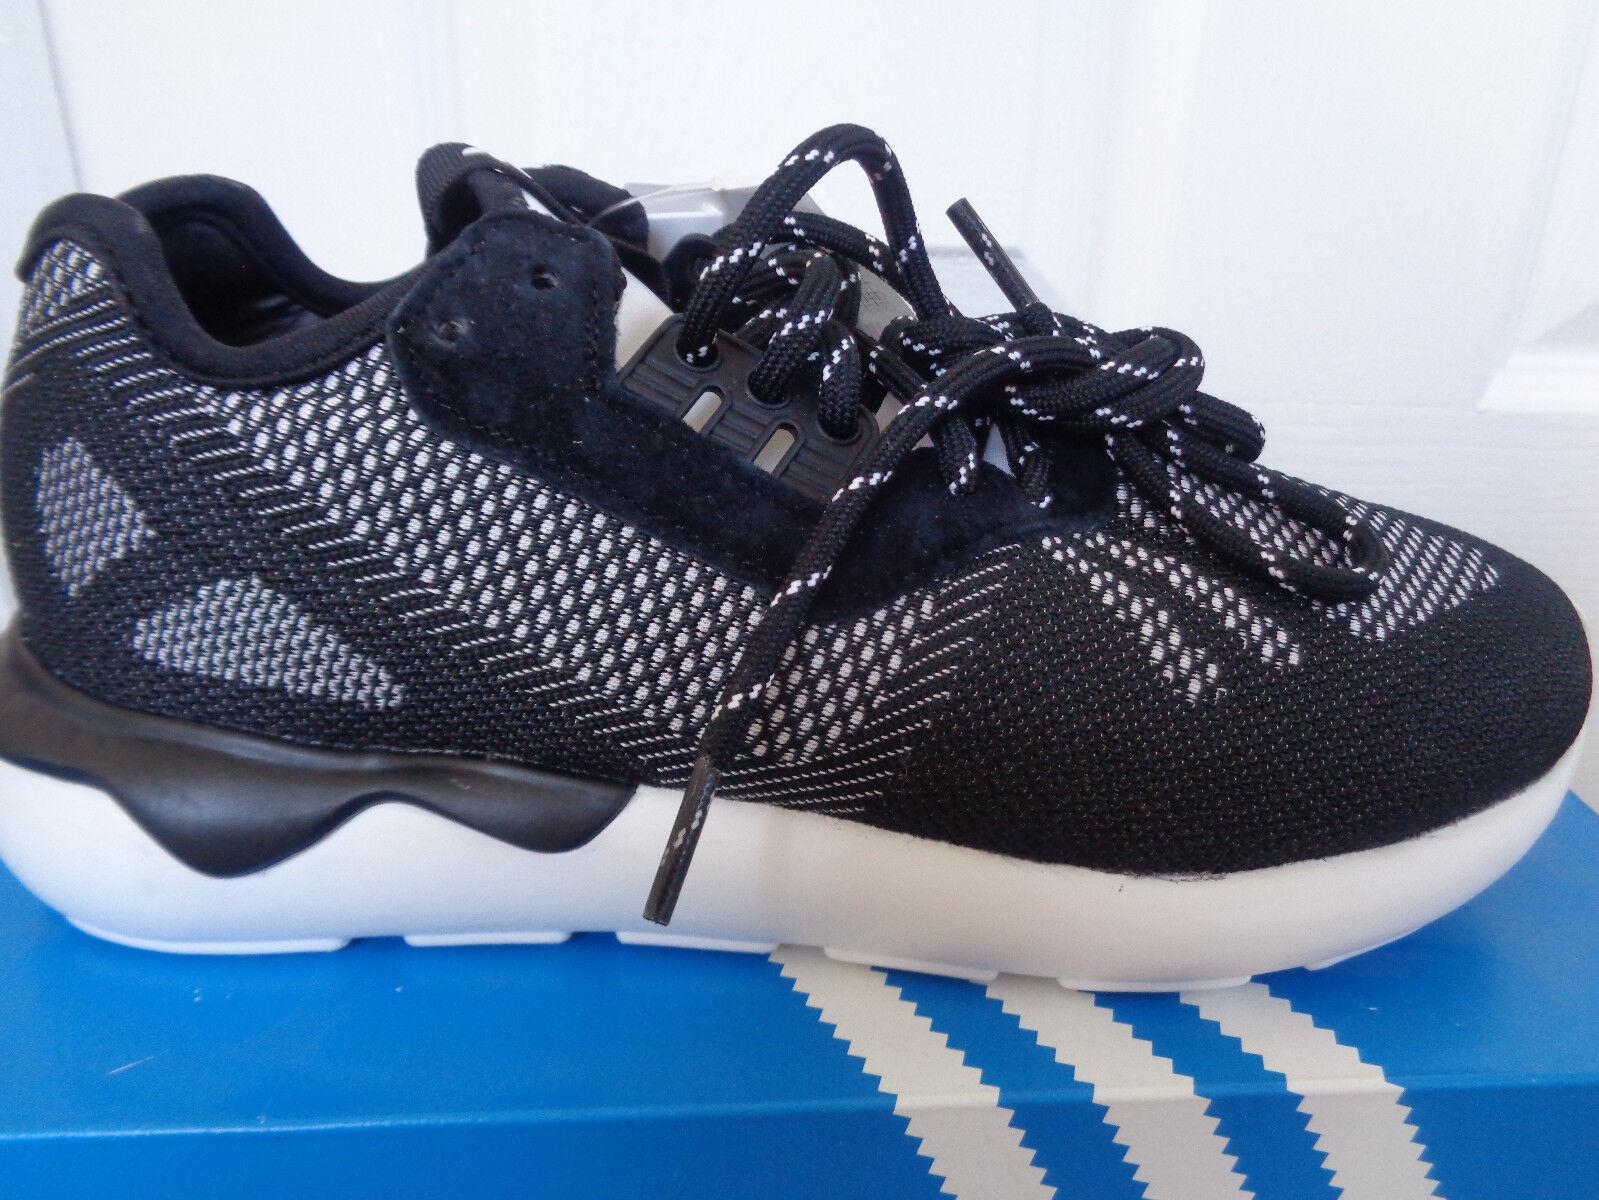 Adidas formatori tubulare runner tessere Uomo formatori Adidas s74813 ue 39 1 / 3 di noi 6,5 nuovi + box 6bf754